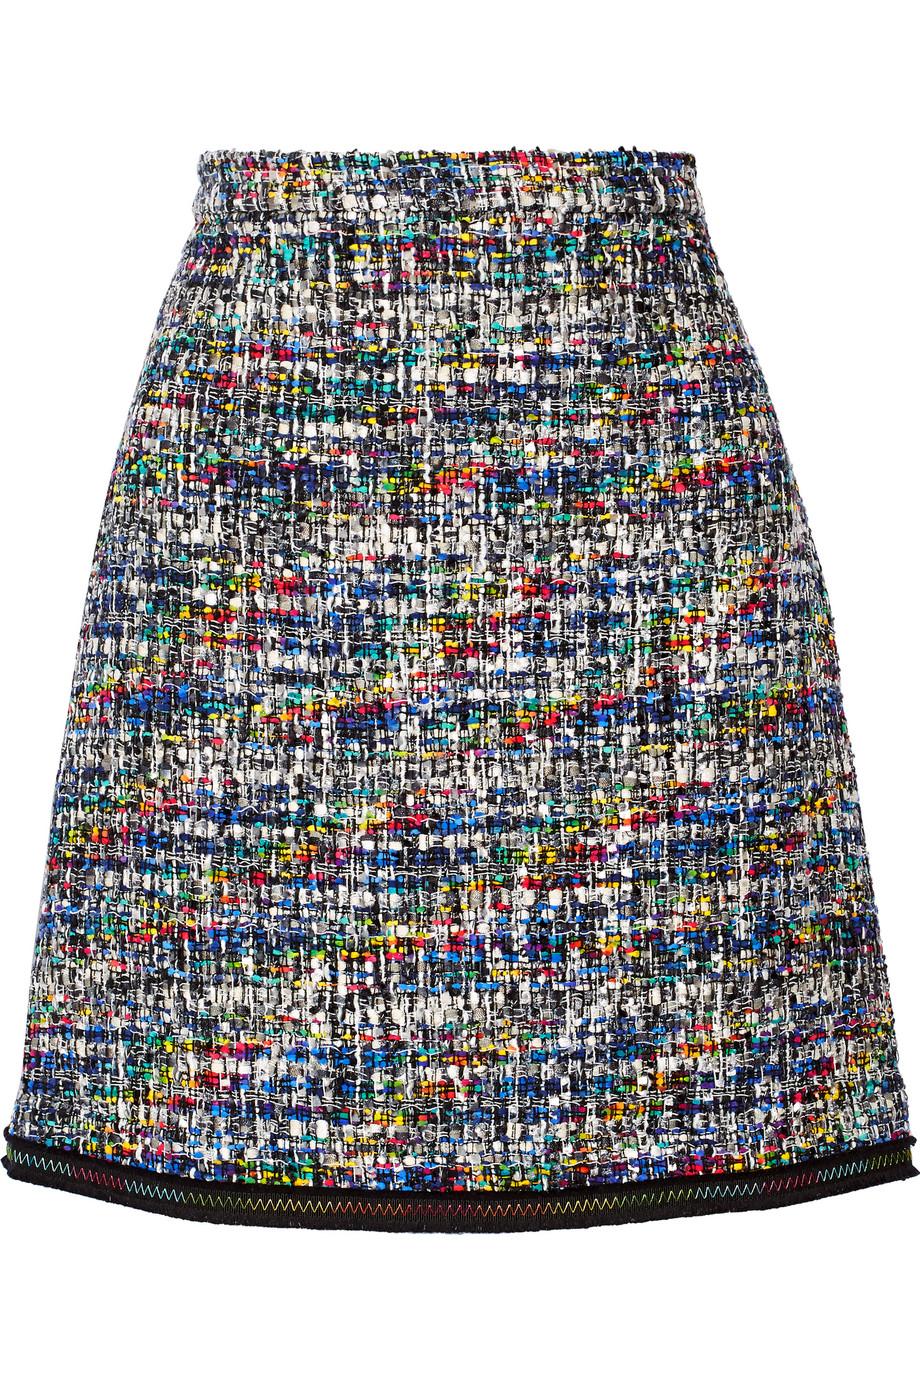 Grosgrain-Trimmed Bouclé-Tweed Mini Skirt, Black, Women's, Size: 48